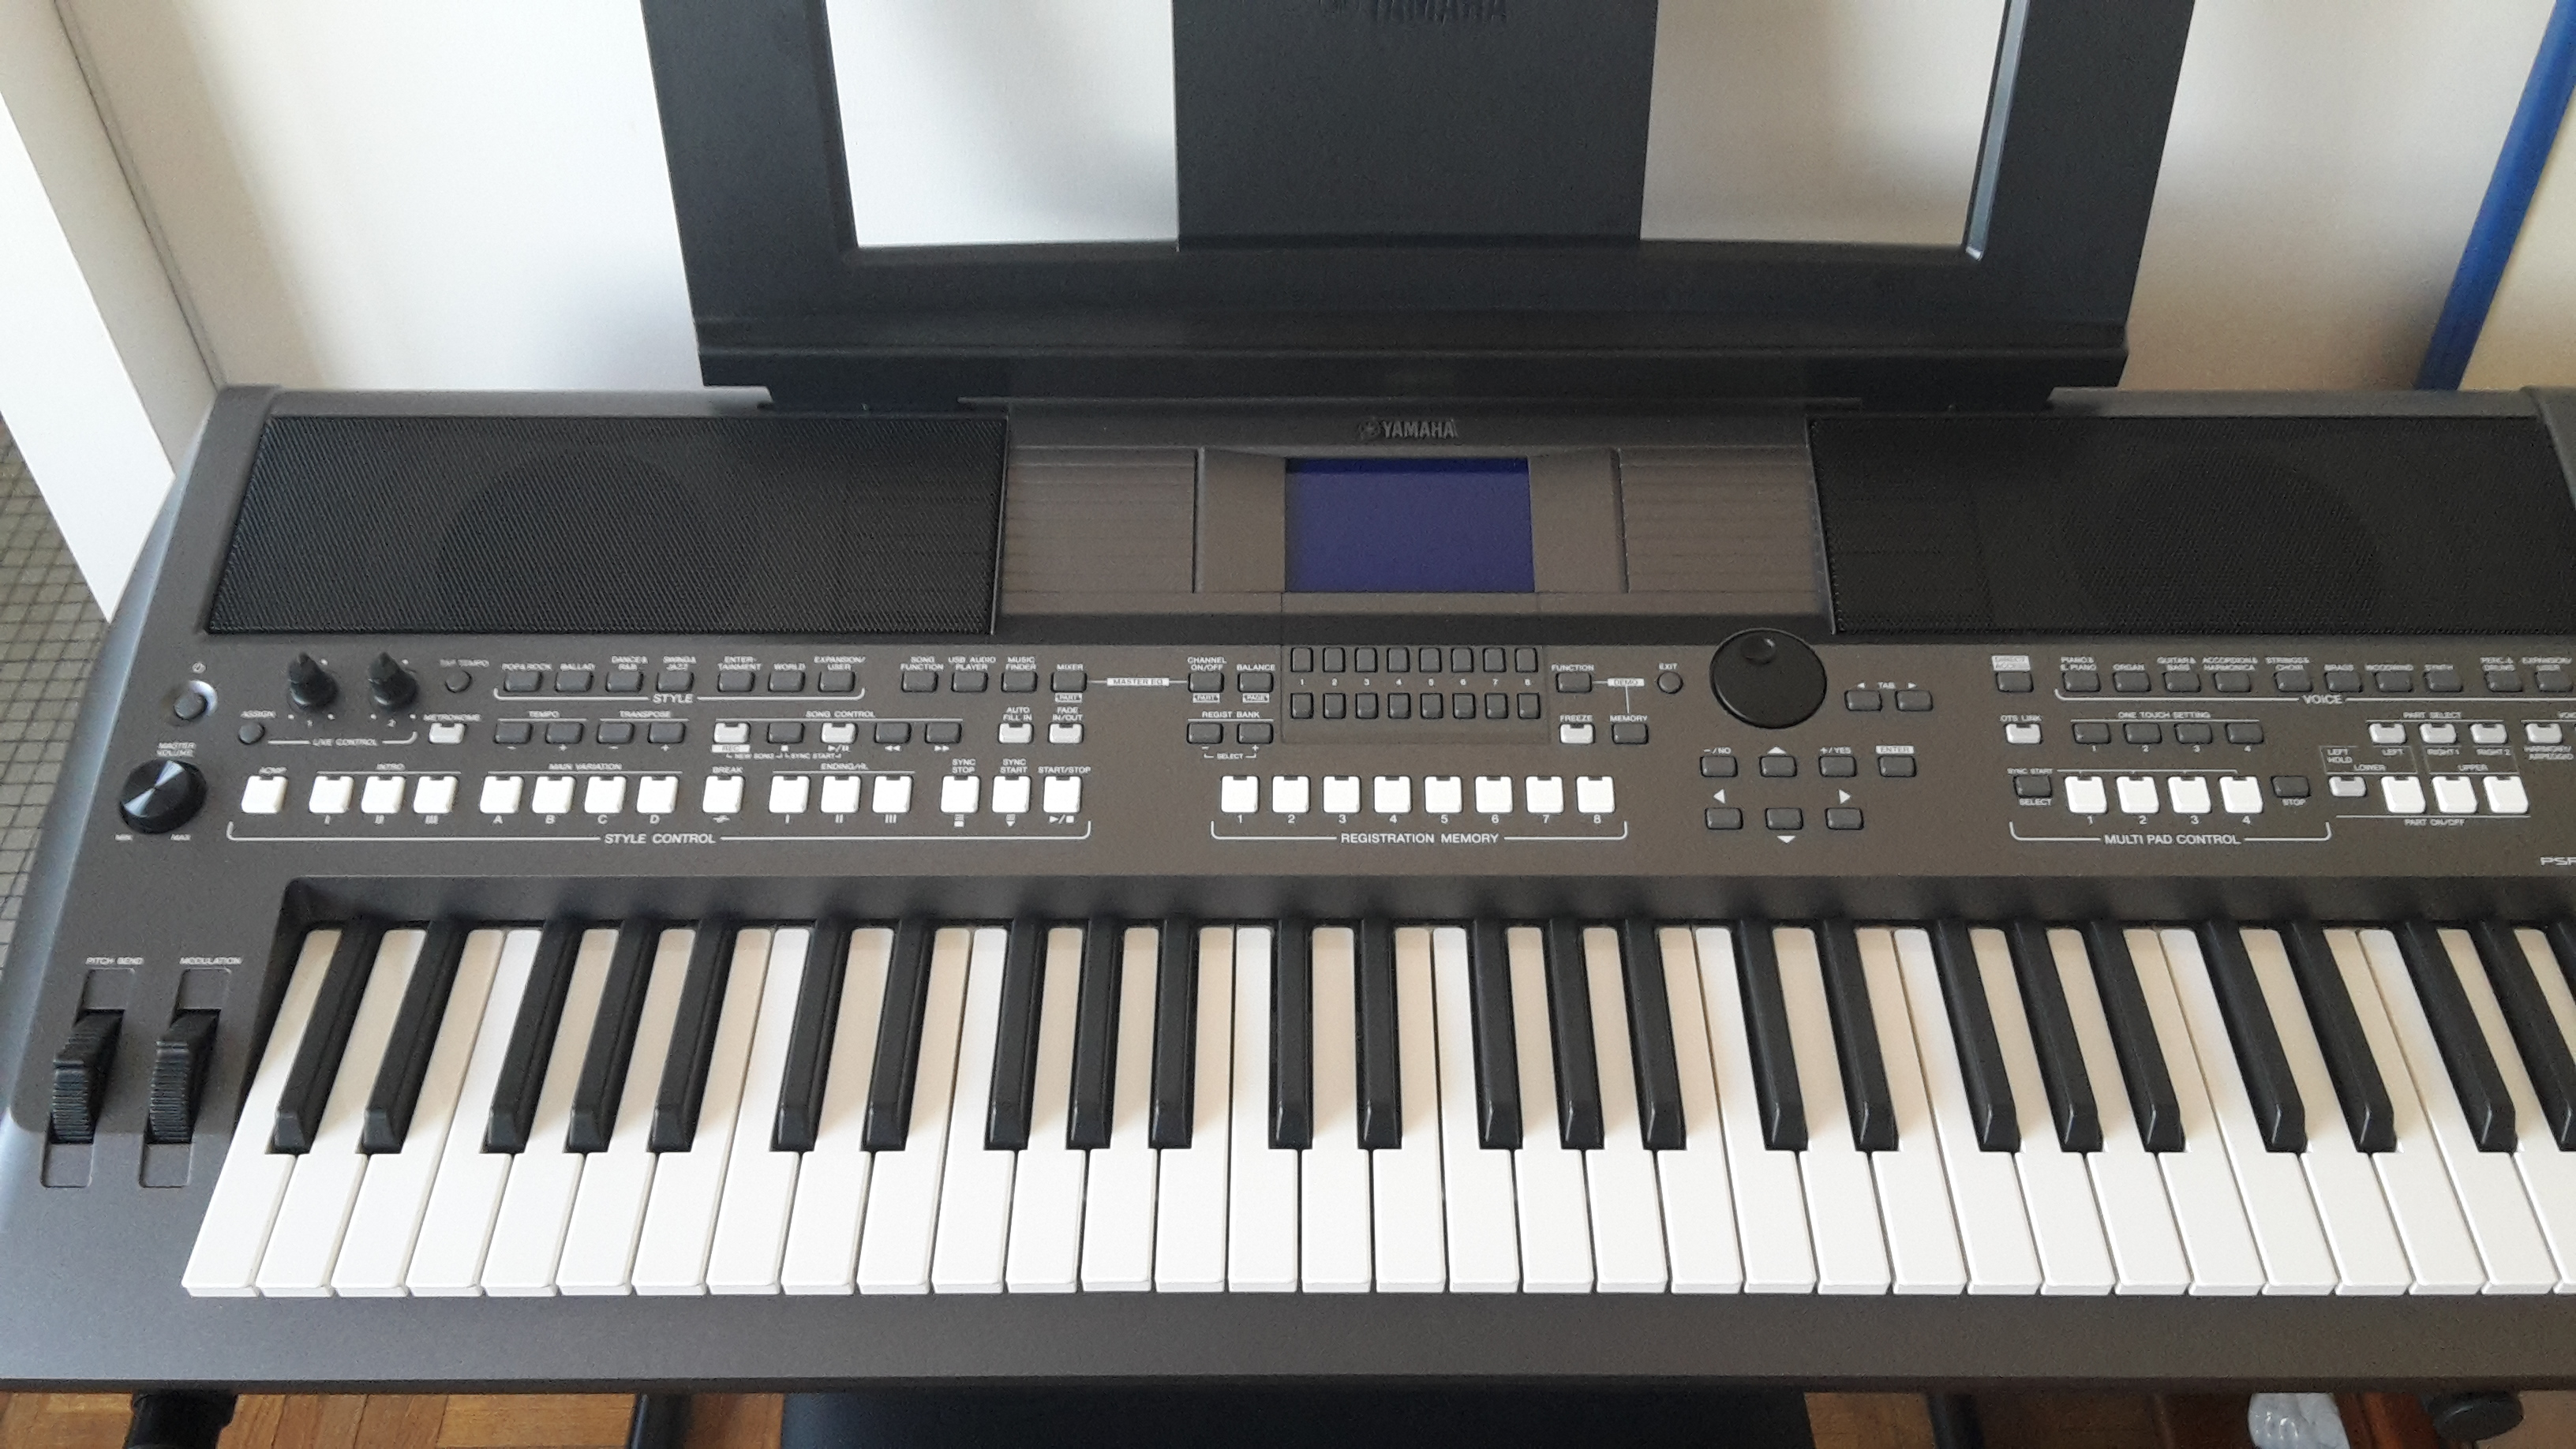 Yamaha psr s670 portable arranger keyboard daftar harga for Yamaha psr ew300 review